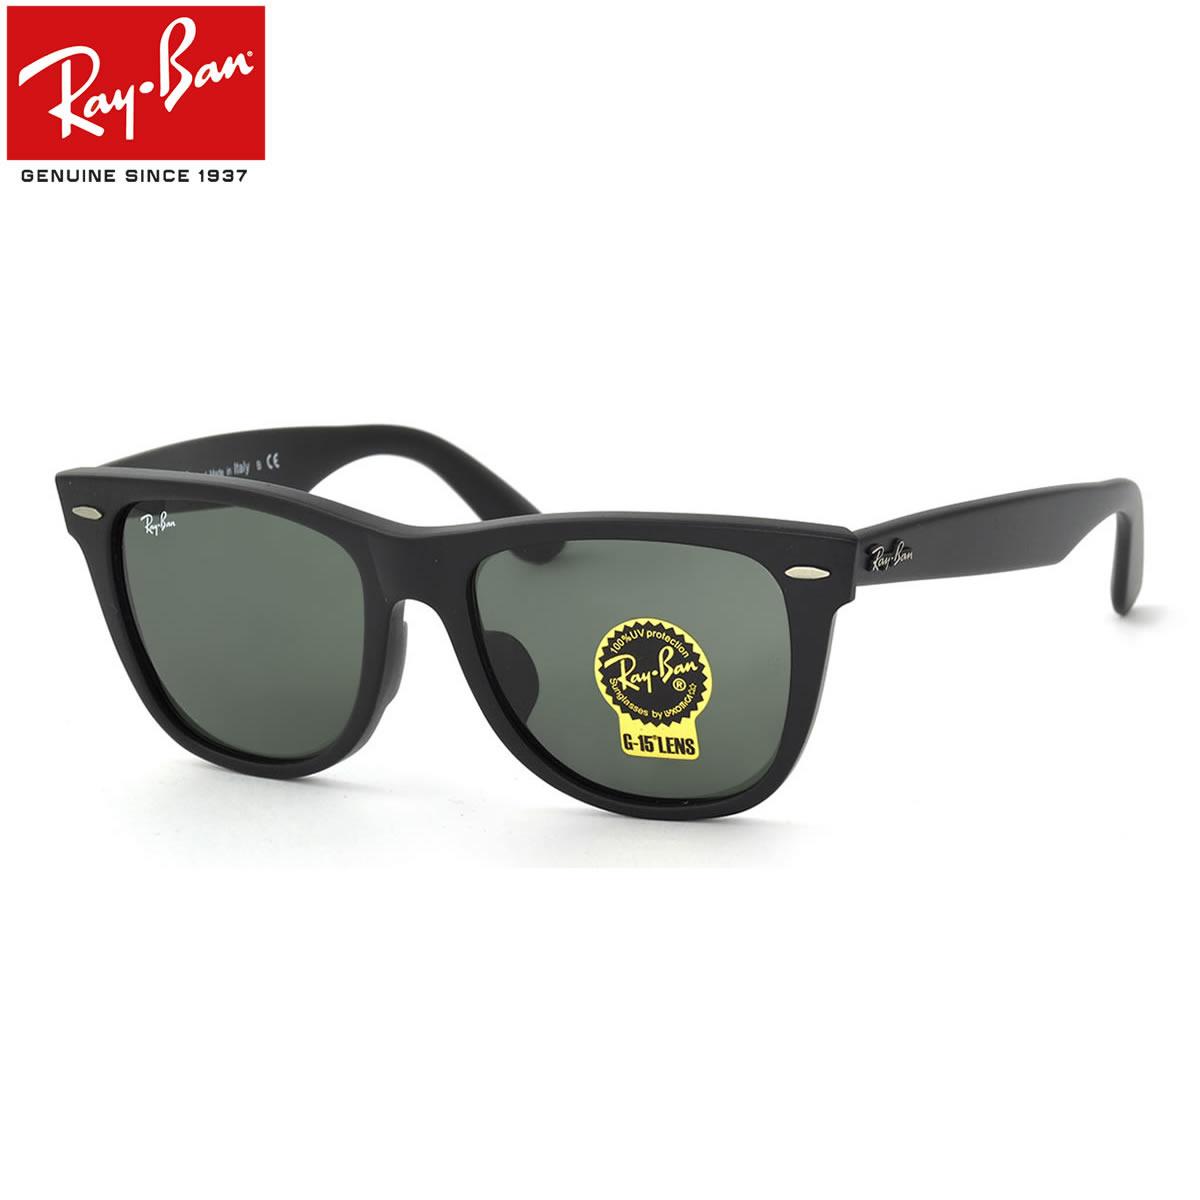 Ray-Ban sunglasses way Farrar Ray-Ban RB2140F 901S 52 size 54 size Ray-Ban  RAYBAN WAYFARER full fitting ICONS icon men gap Dis